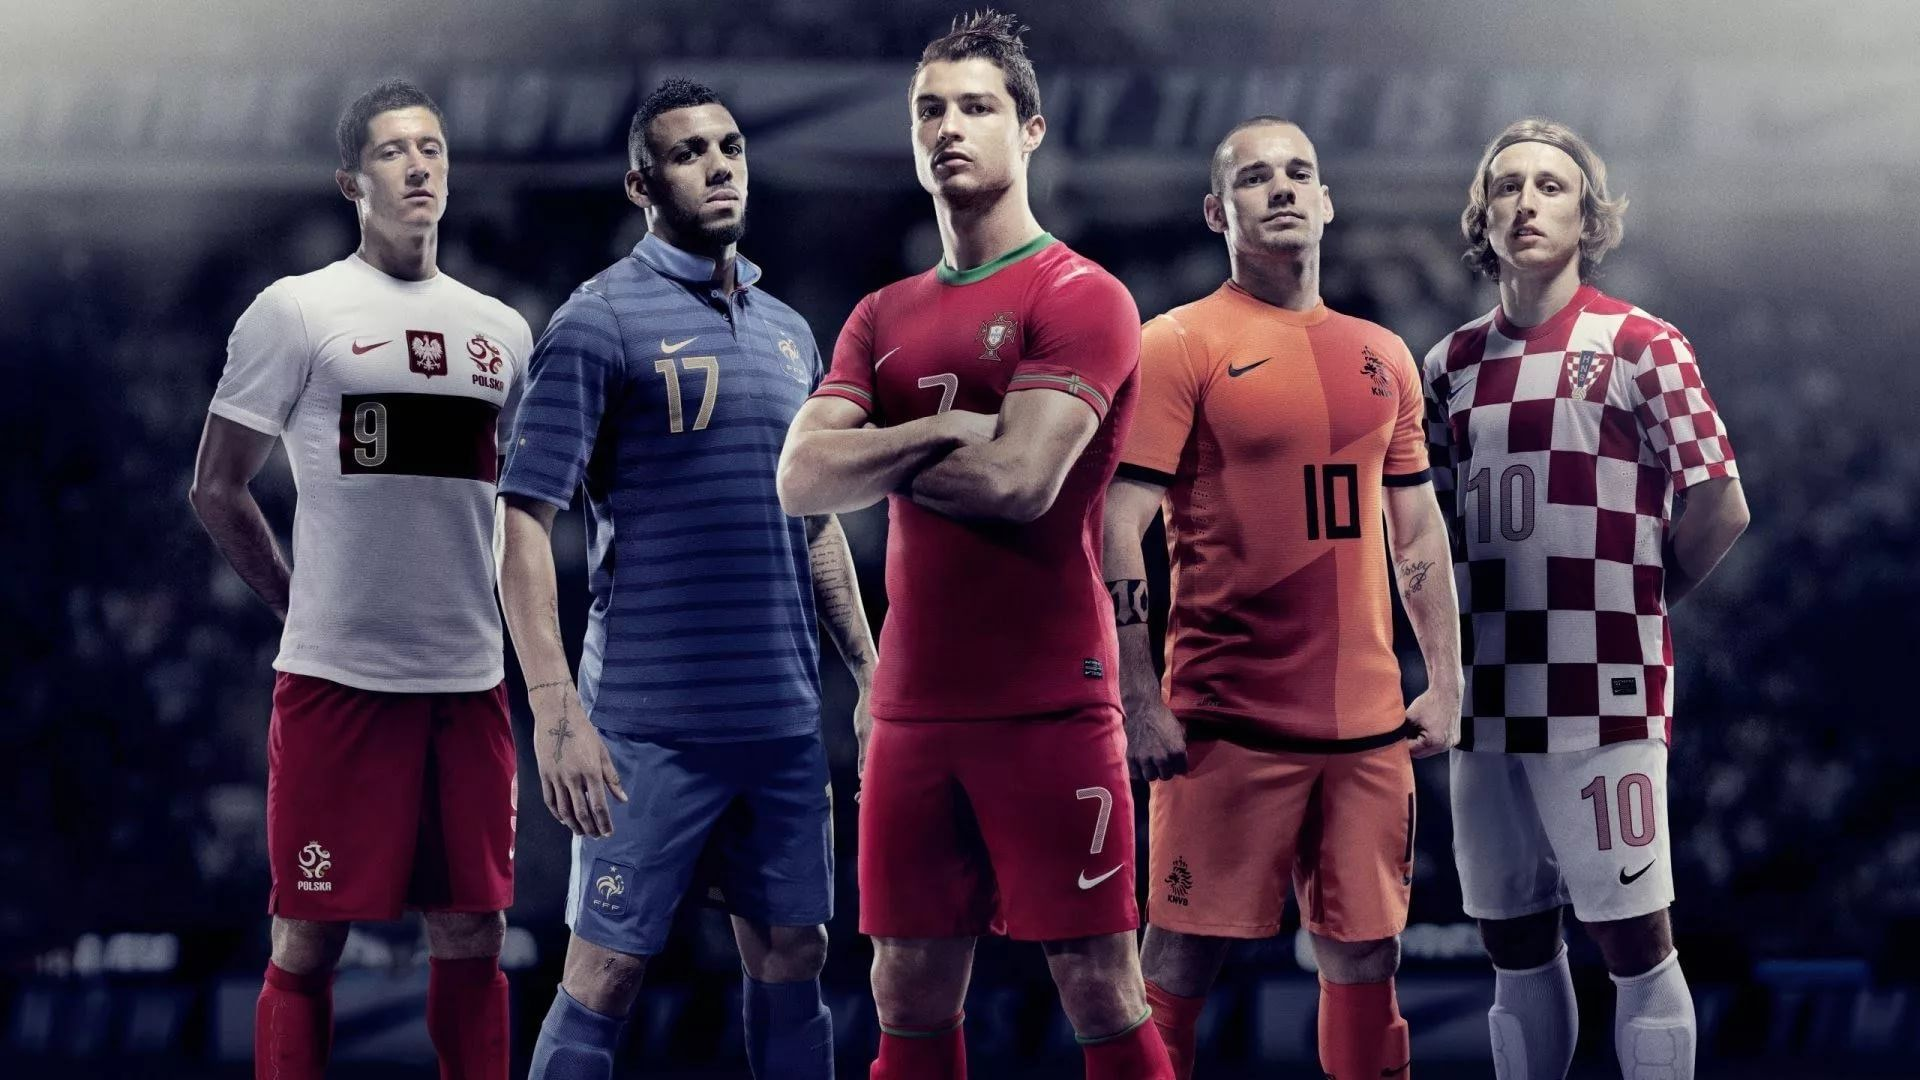 Soccer Player new wallpaper